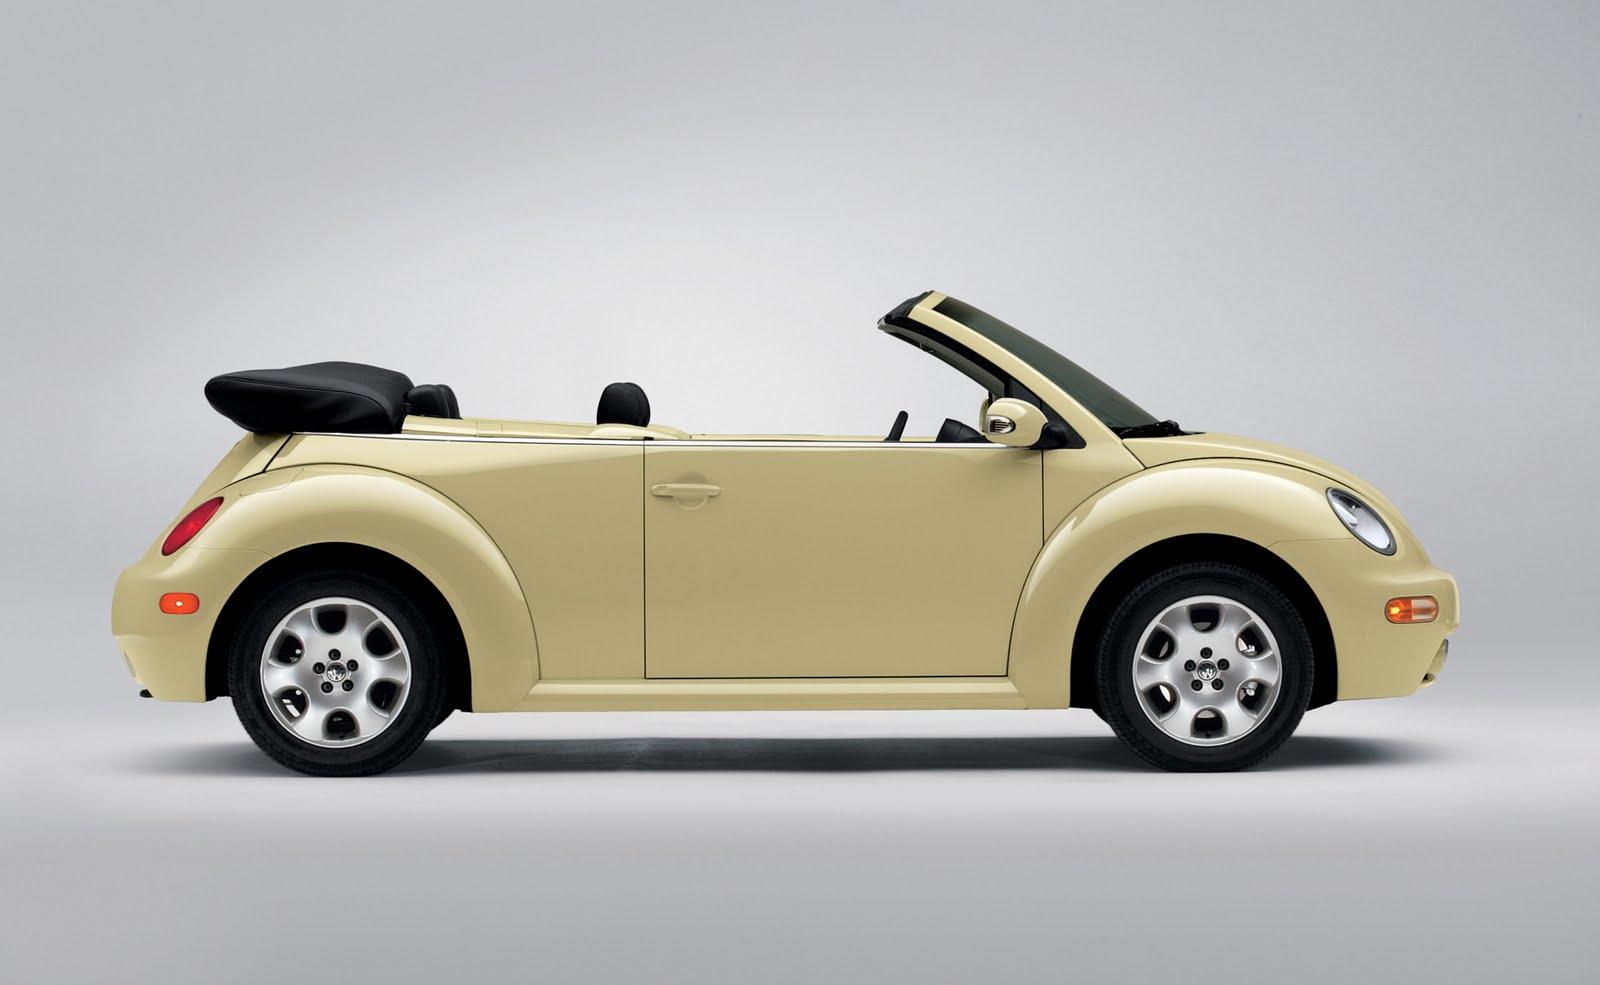 http://2.bp.blogspot.com/-zo9Z7qQDCic/Tak8vHgjsTI/AAAAAAAAA4M/ao2EHgppEsE/s1600/foto21-volkswagen-new-beetle-cabriolet1.jpg